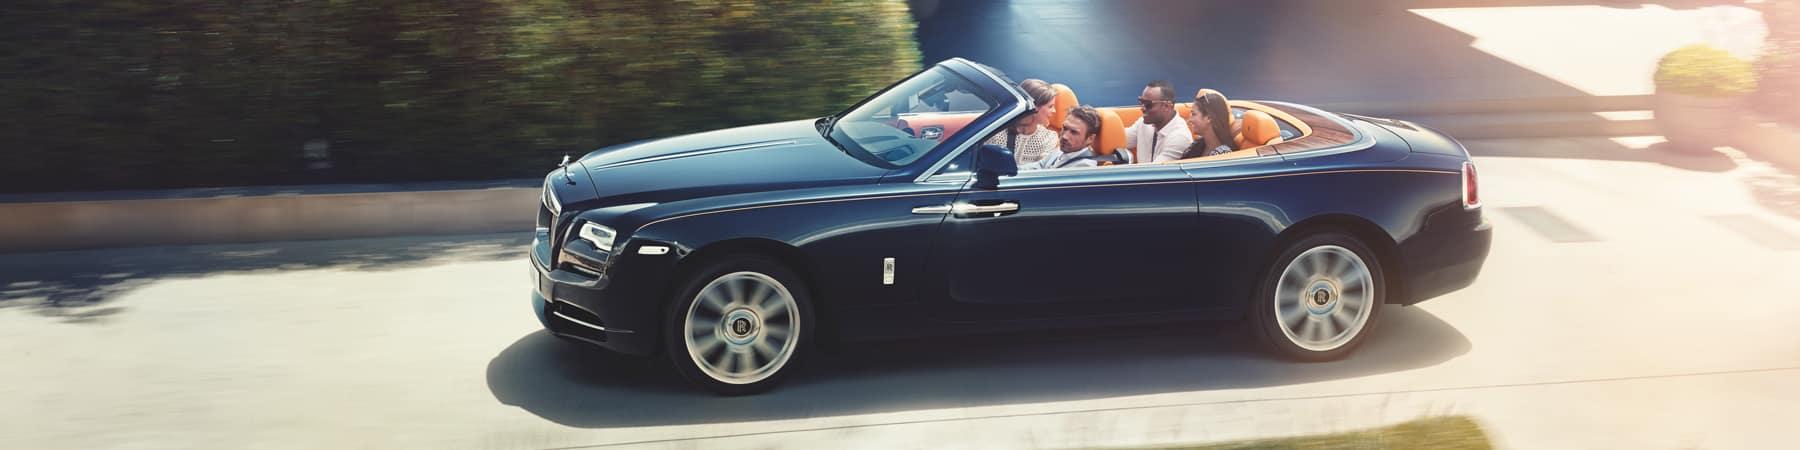 New Rolls-Royce Dawn for Sale in Charleston, SC